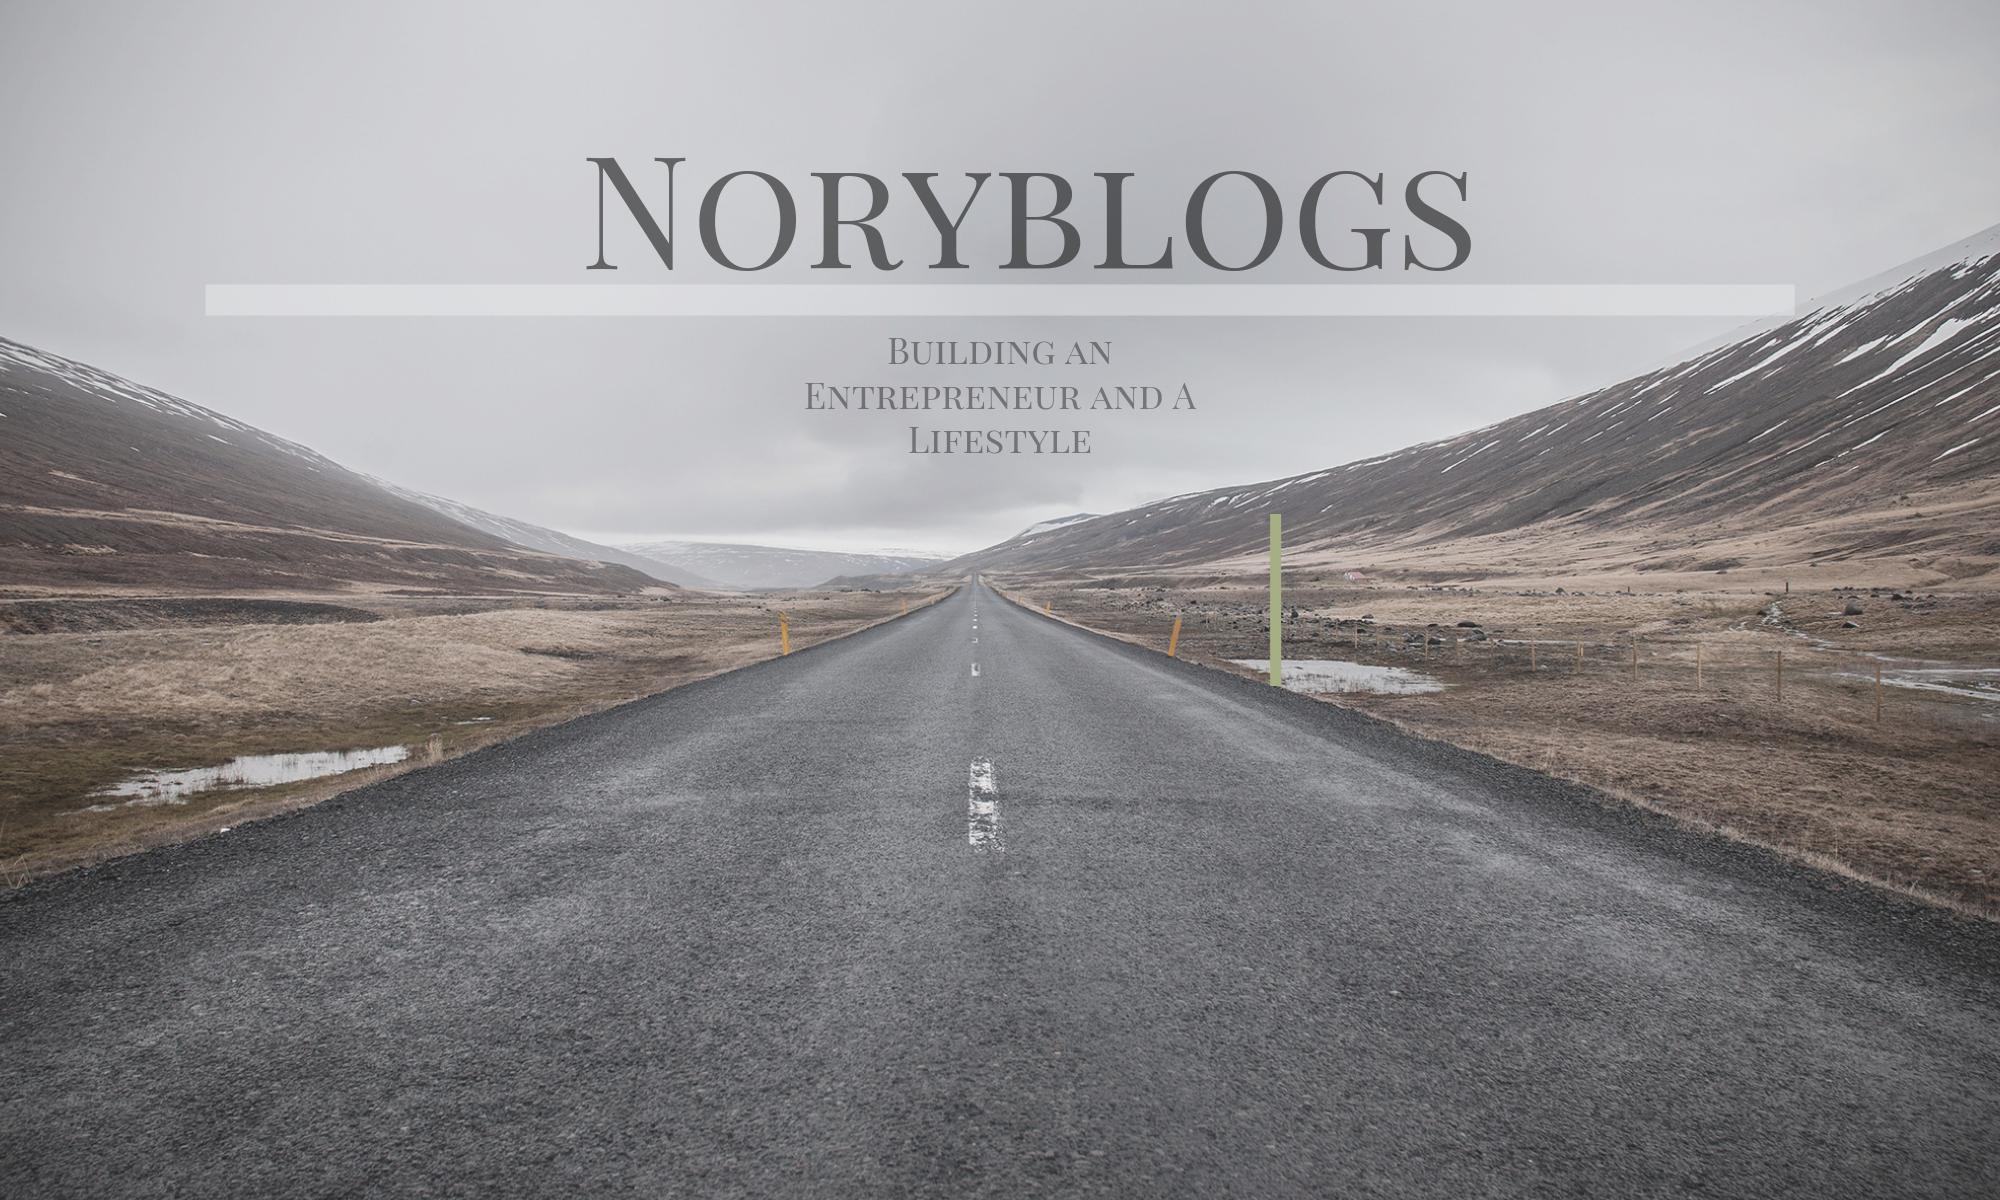 Blog Post's